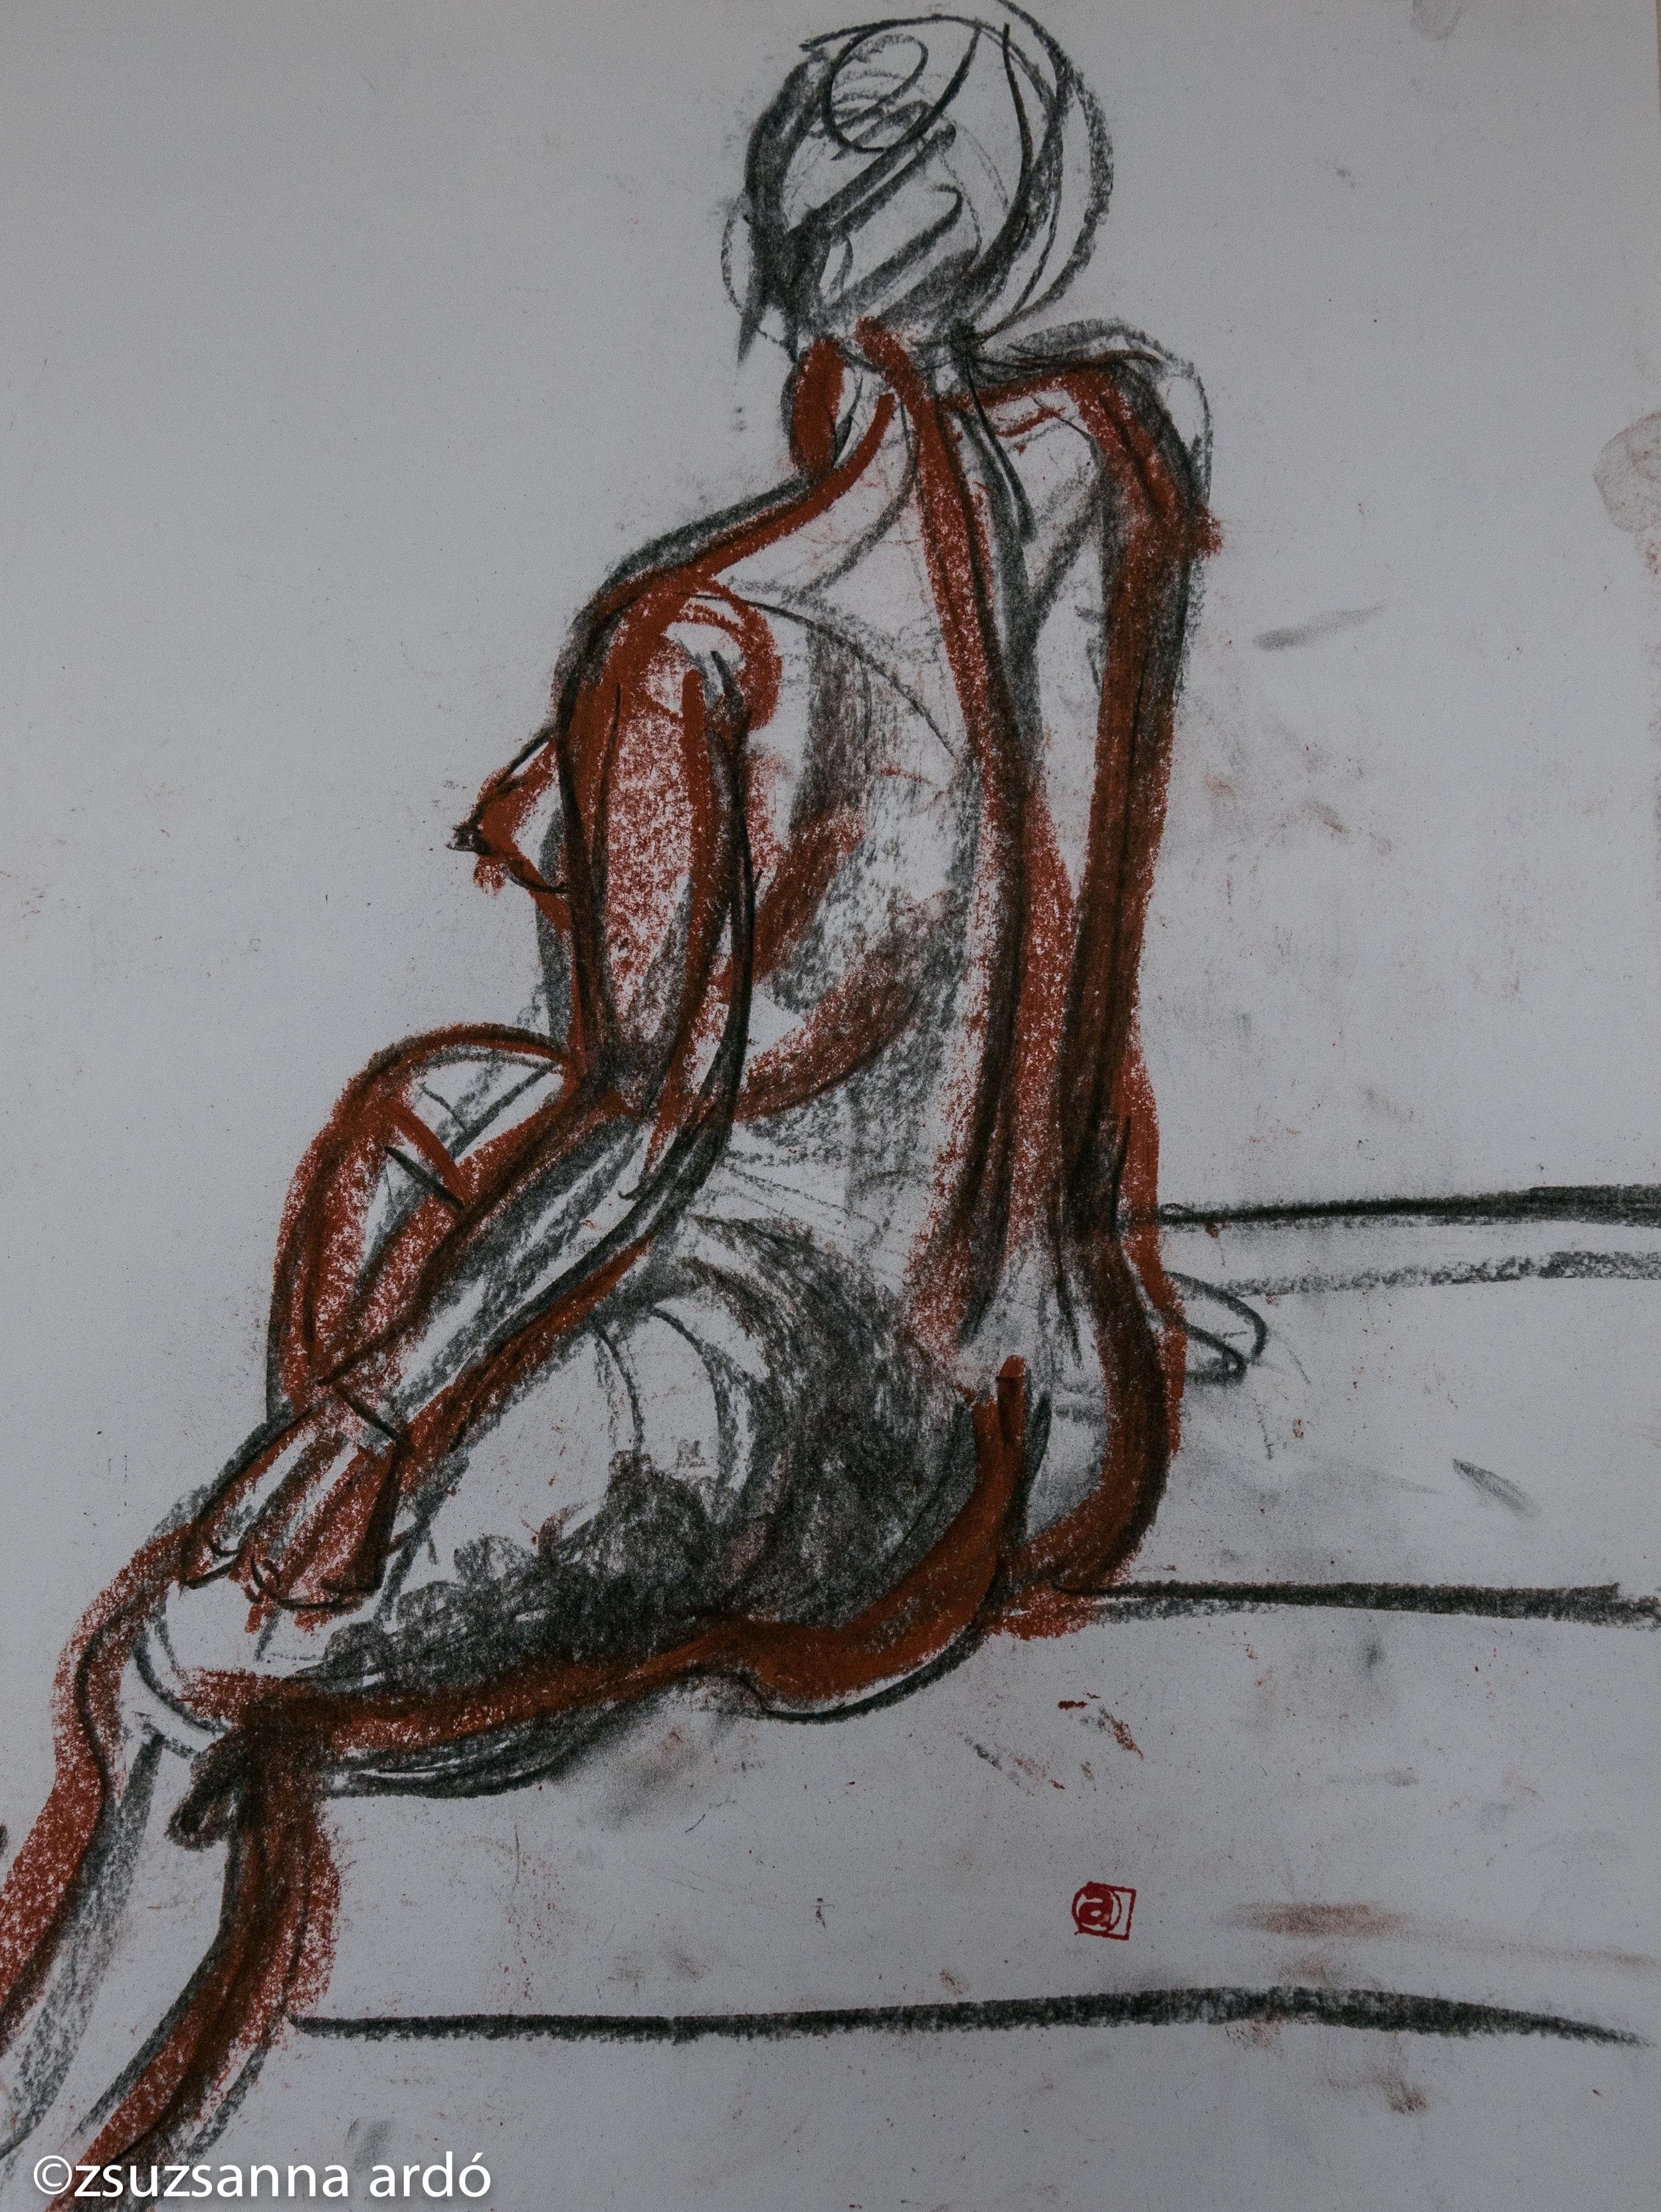 17 UK lon RA nudes 5Spt©Zsuzsanna Ardó-3.jpg